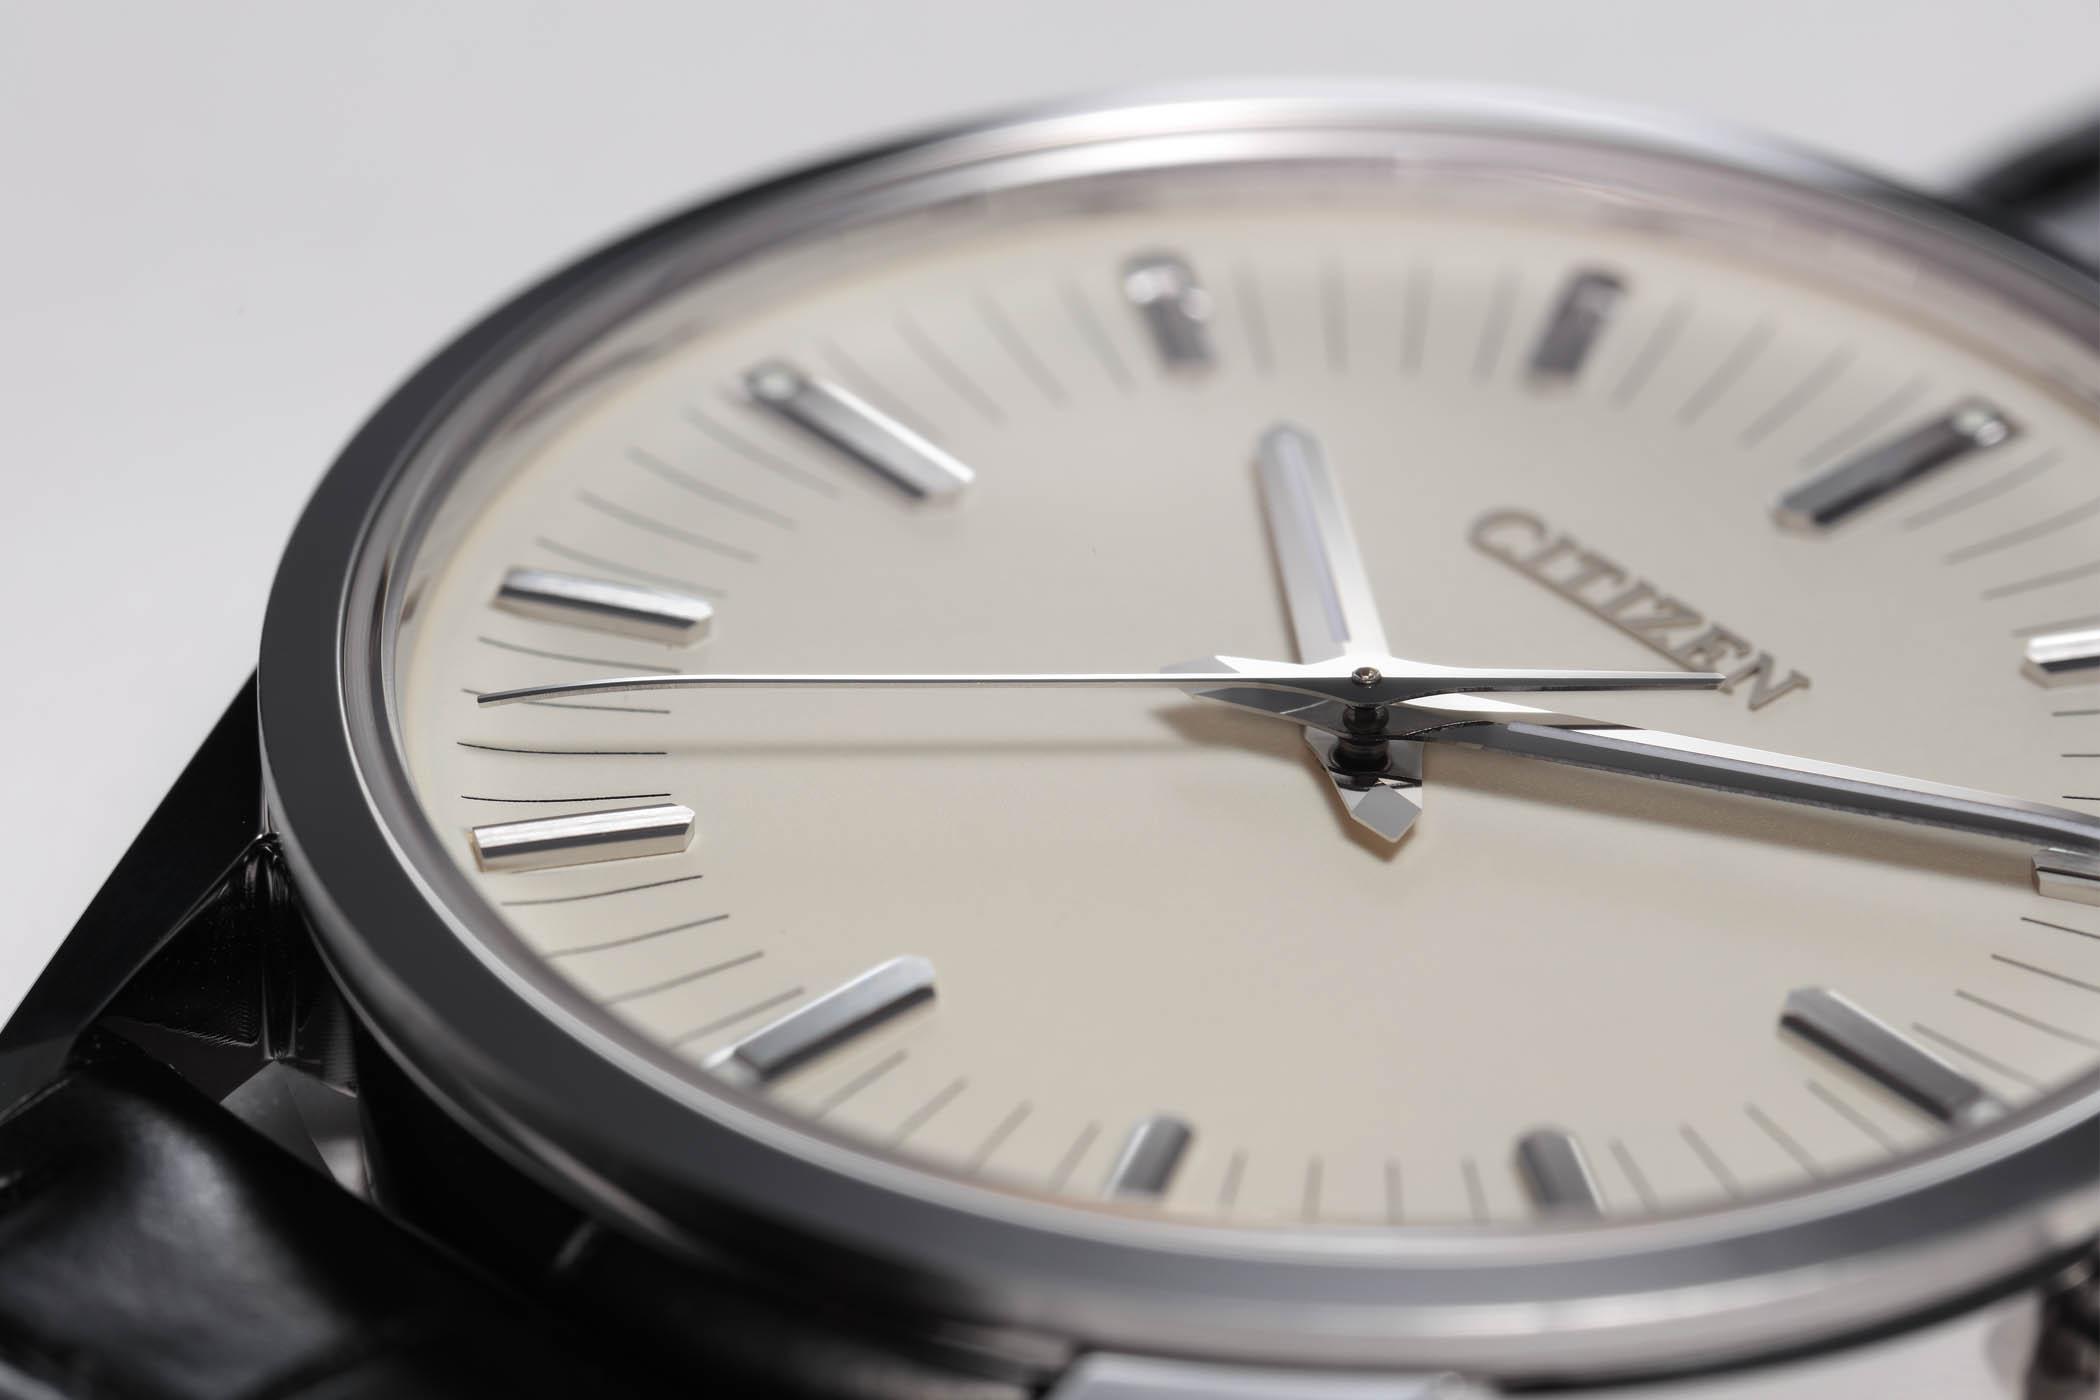 Baselworld 2019 - Citizen Caliber 0100 - 1 second a year accuracy - 3